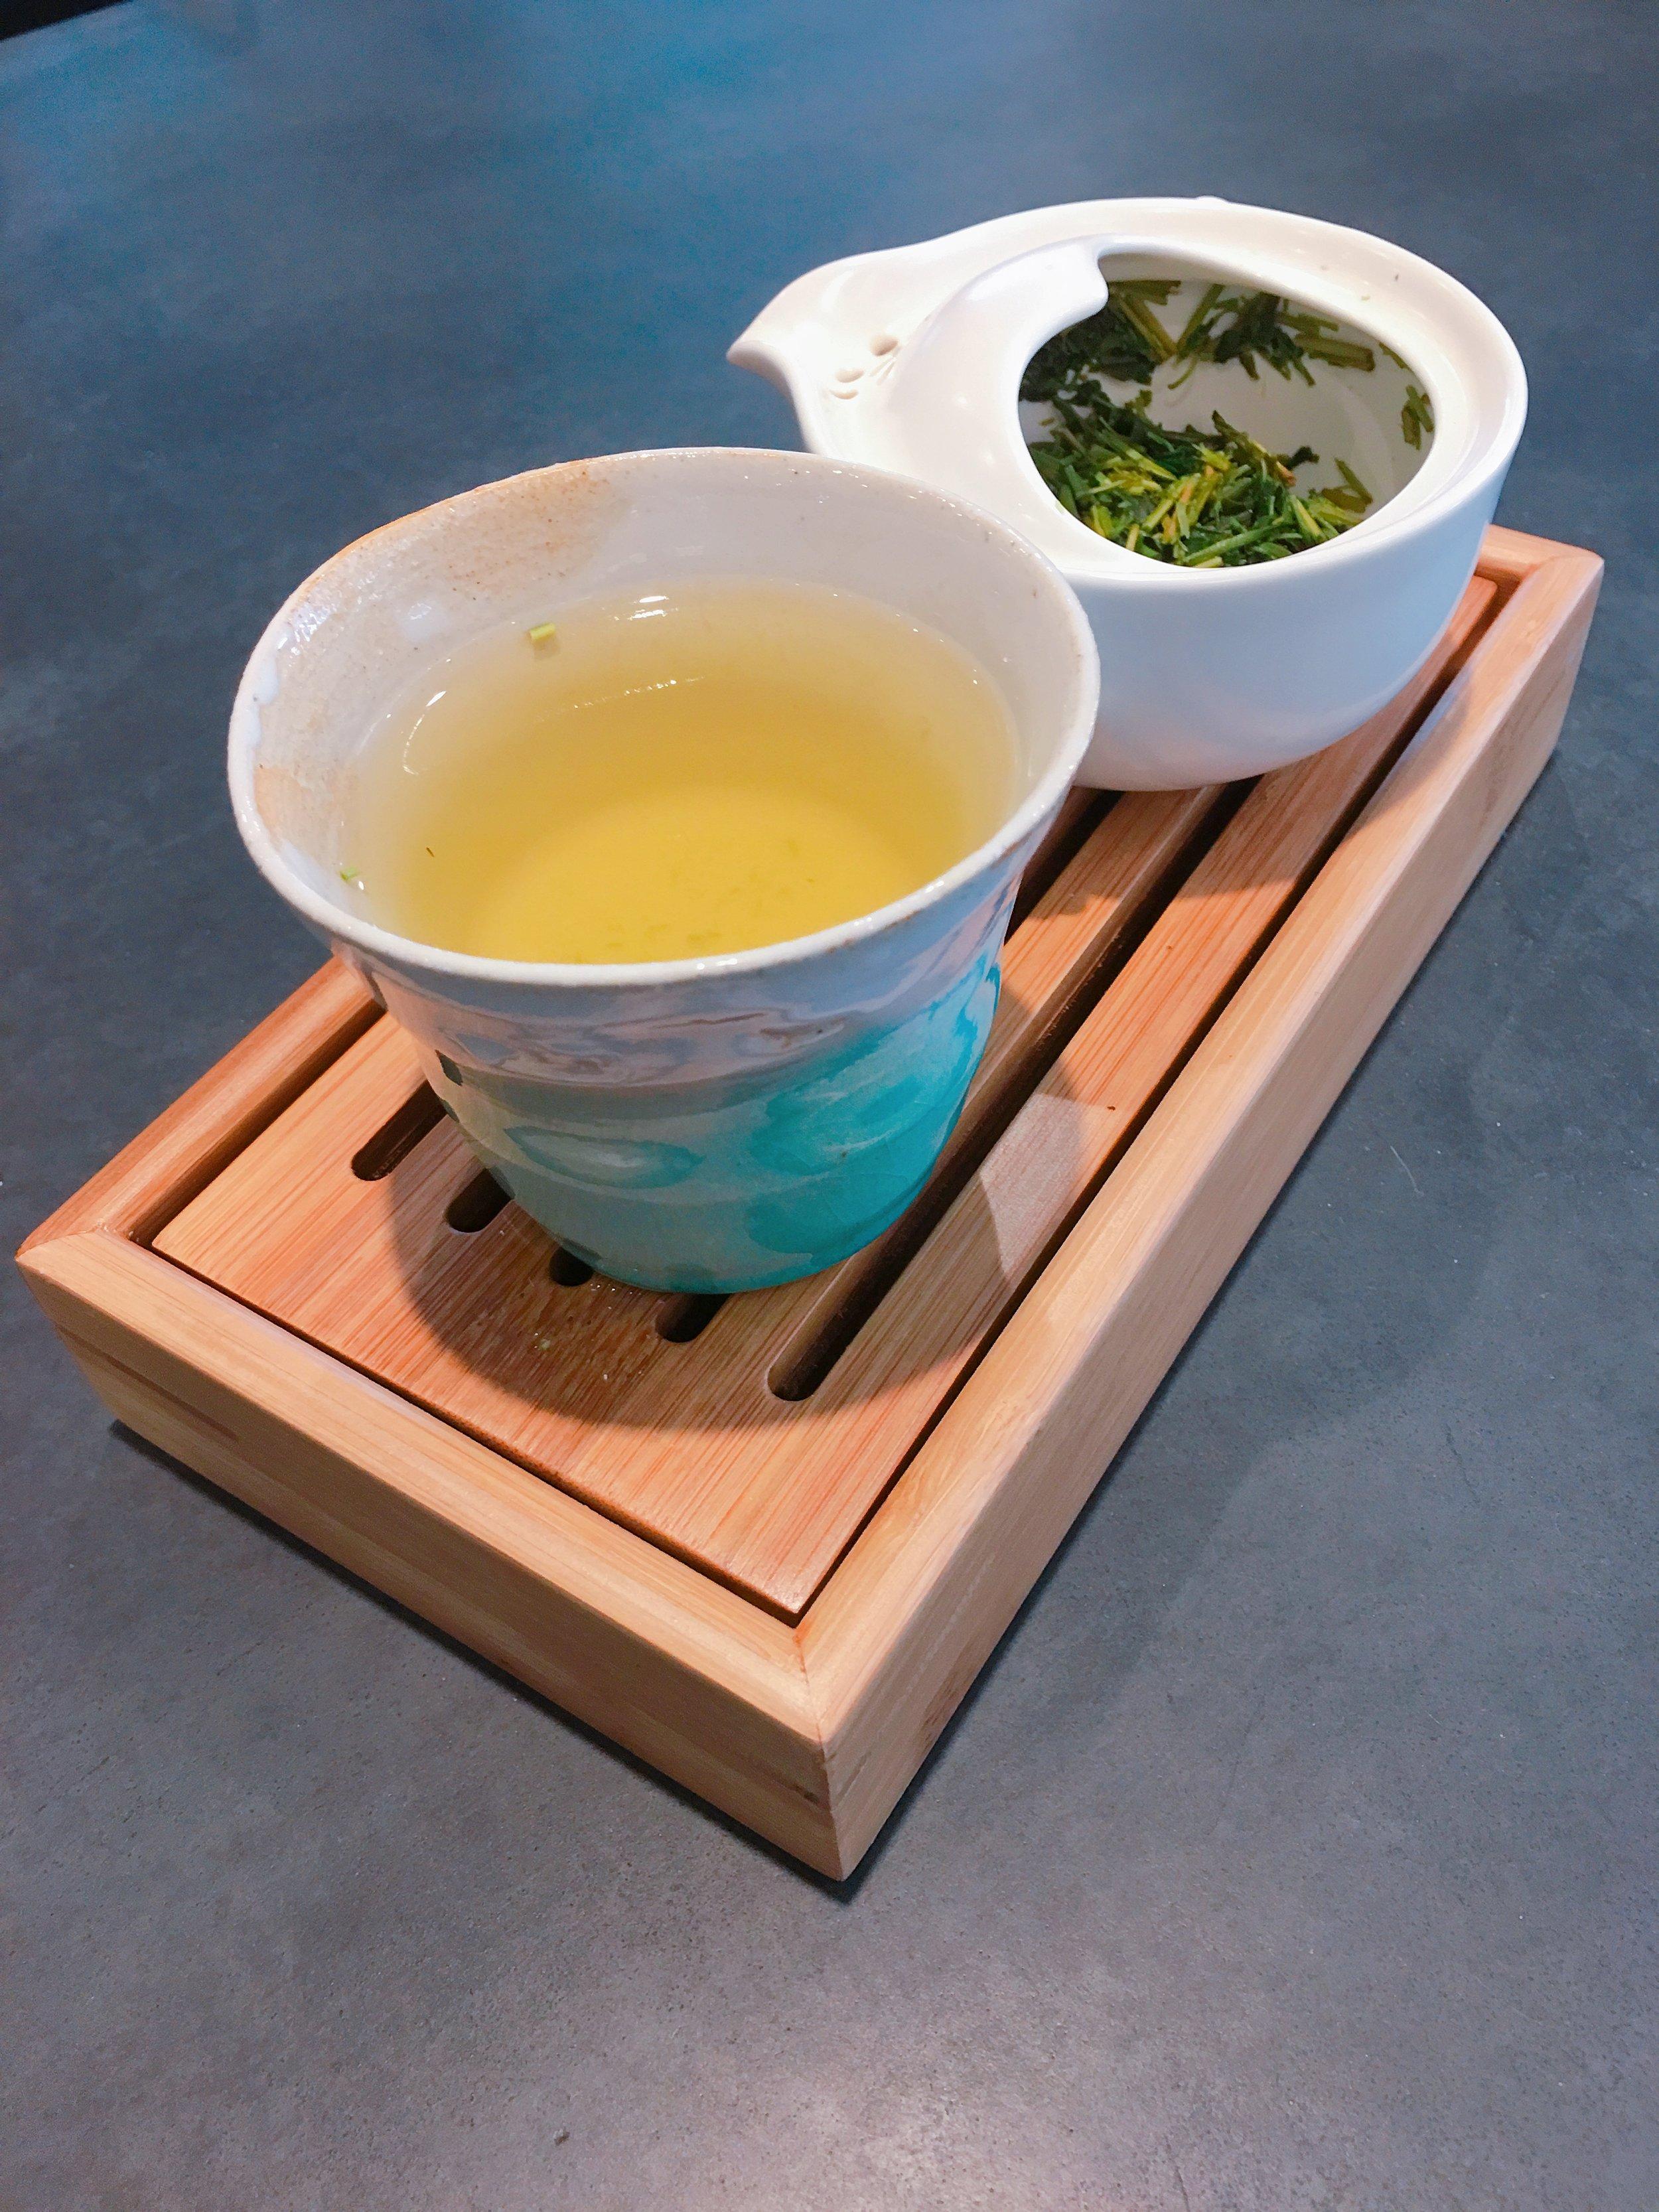 My tea setup at work